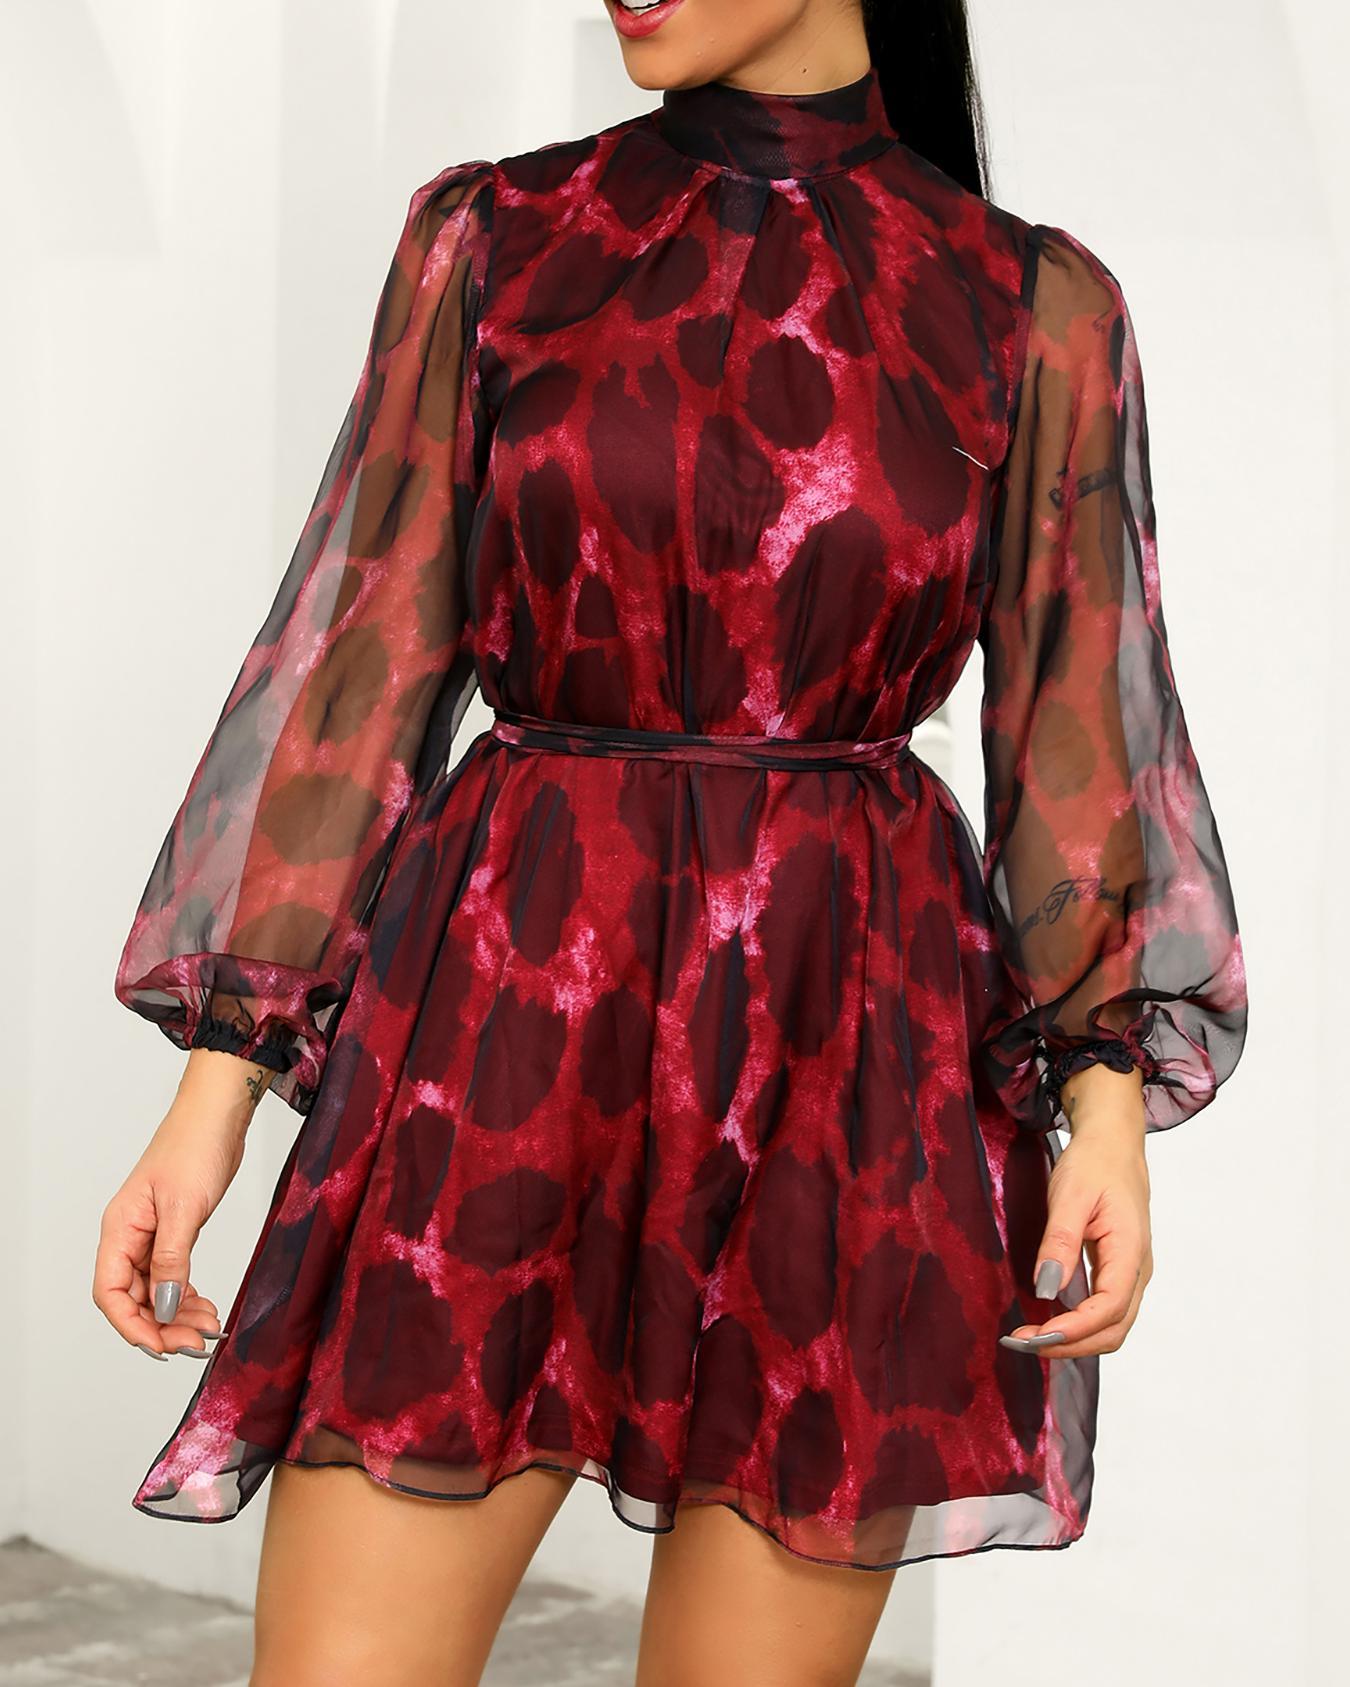 Leopard Sheer Mesh Overlay Belted Dress